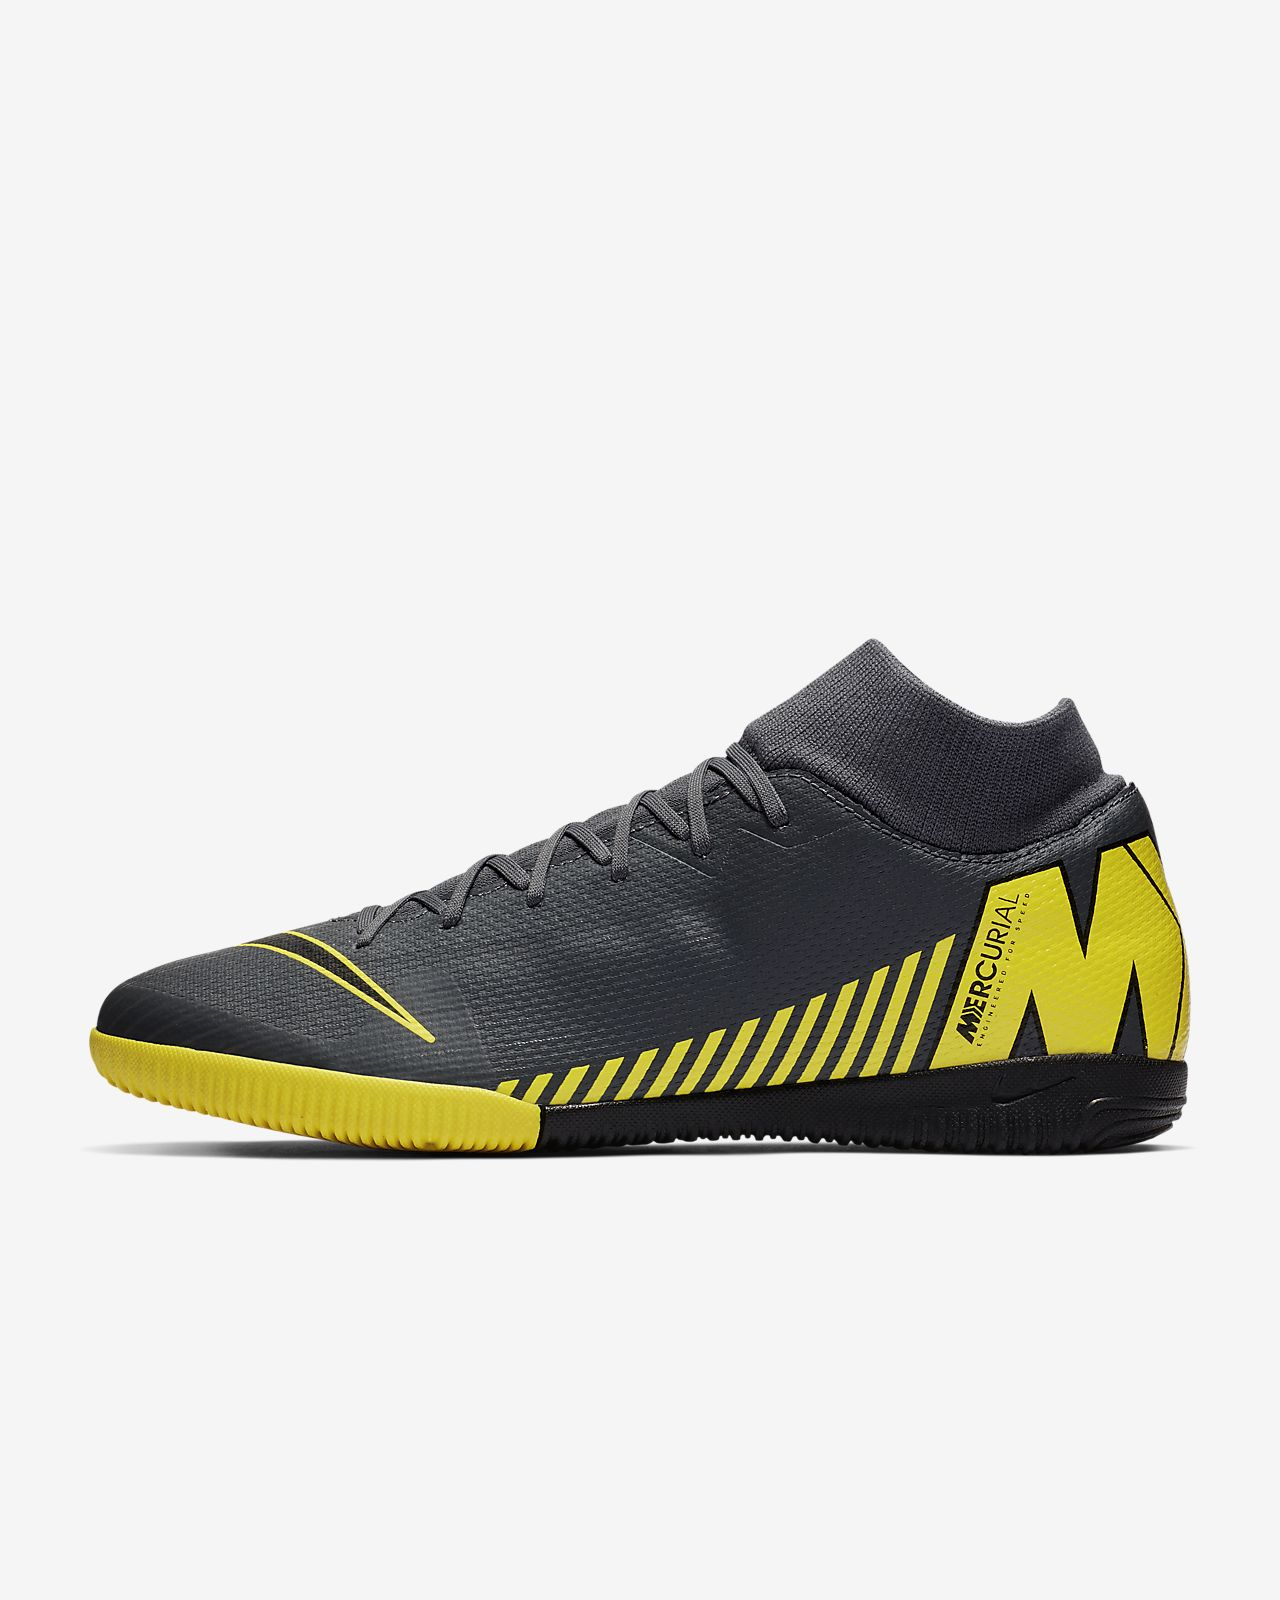 Nike SuperflyX 6 Academy IC 體育館/路面英式足球釘鞋